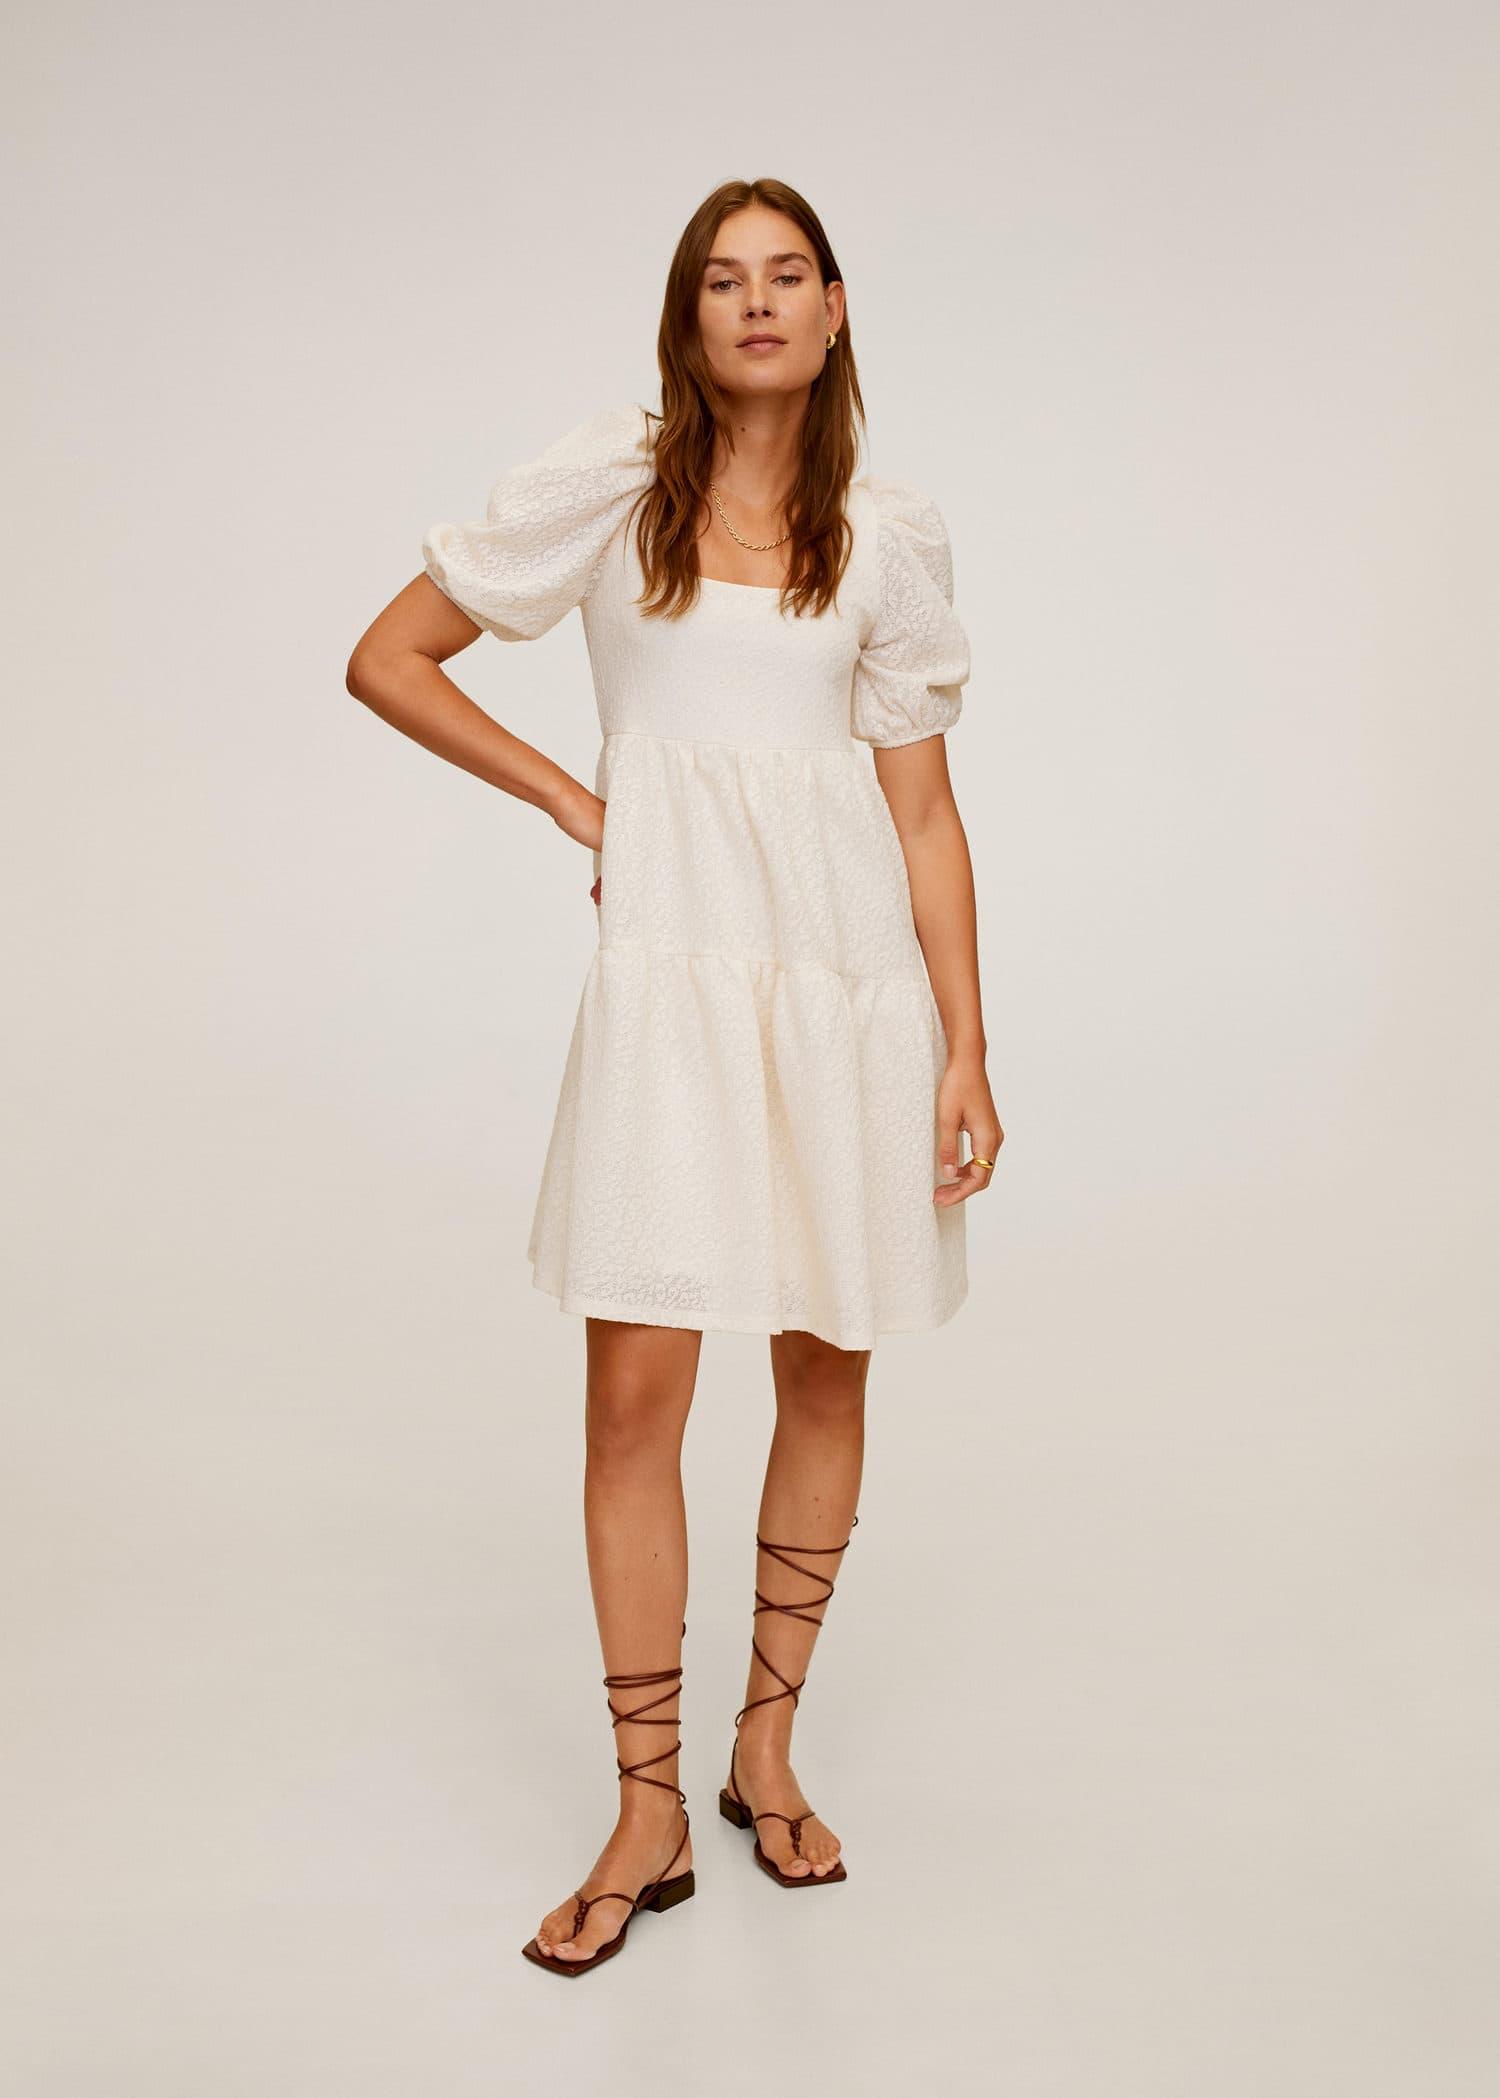 Dresses for Woman 2020 | MNG Australia